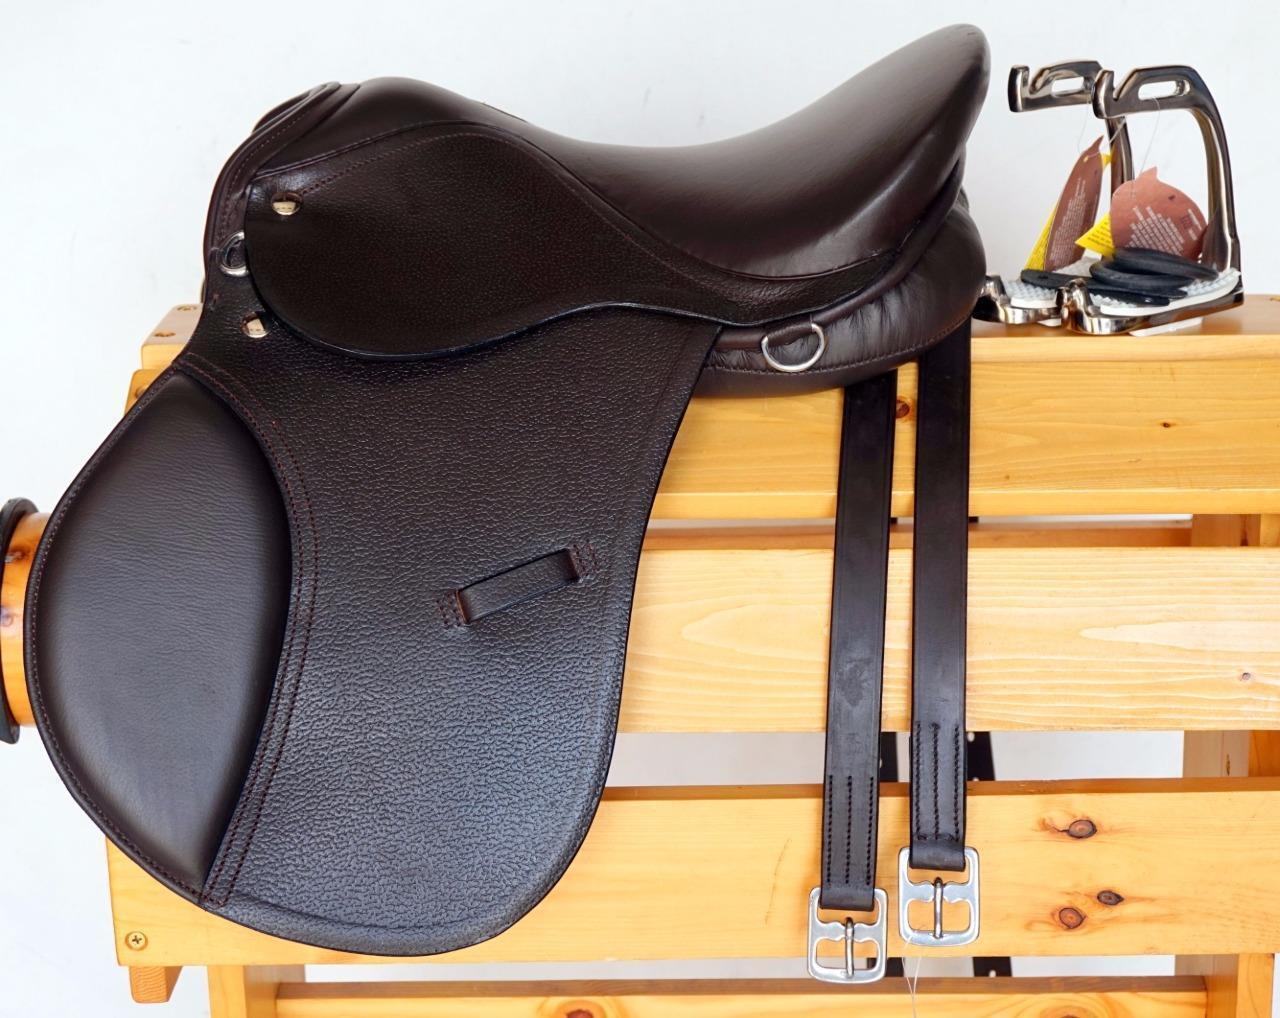 12  13  Marrón Mini Pony Inglés Silla Caza Salto Cualquier Uso + Leathers 36